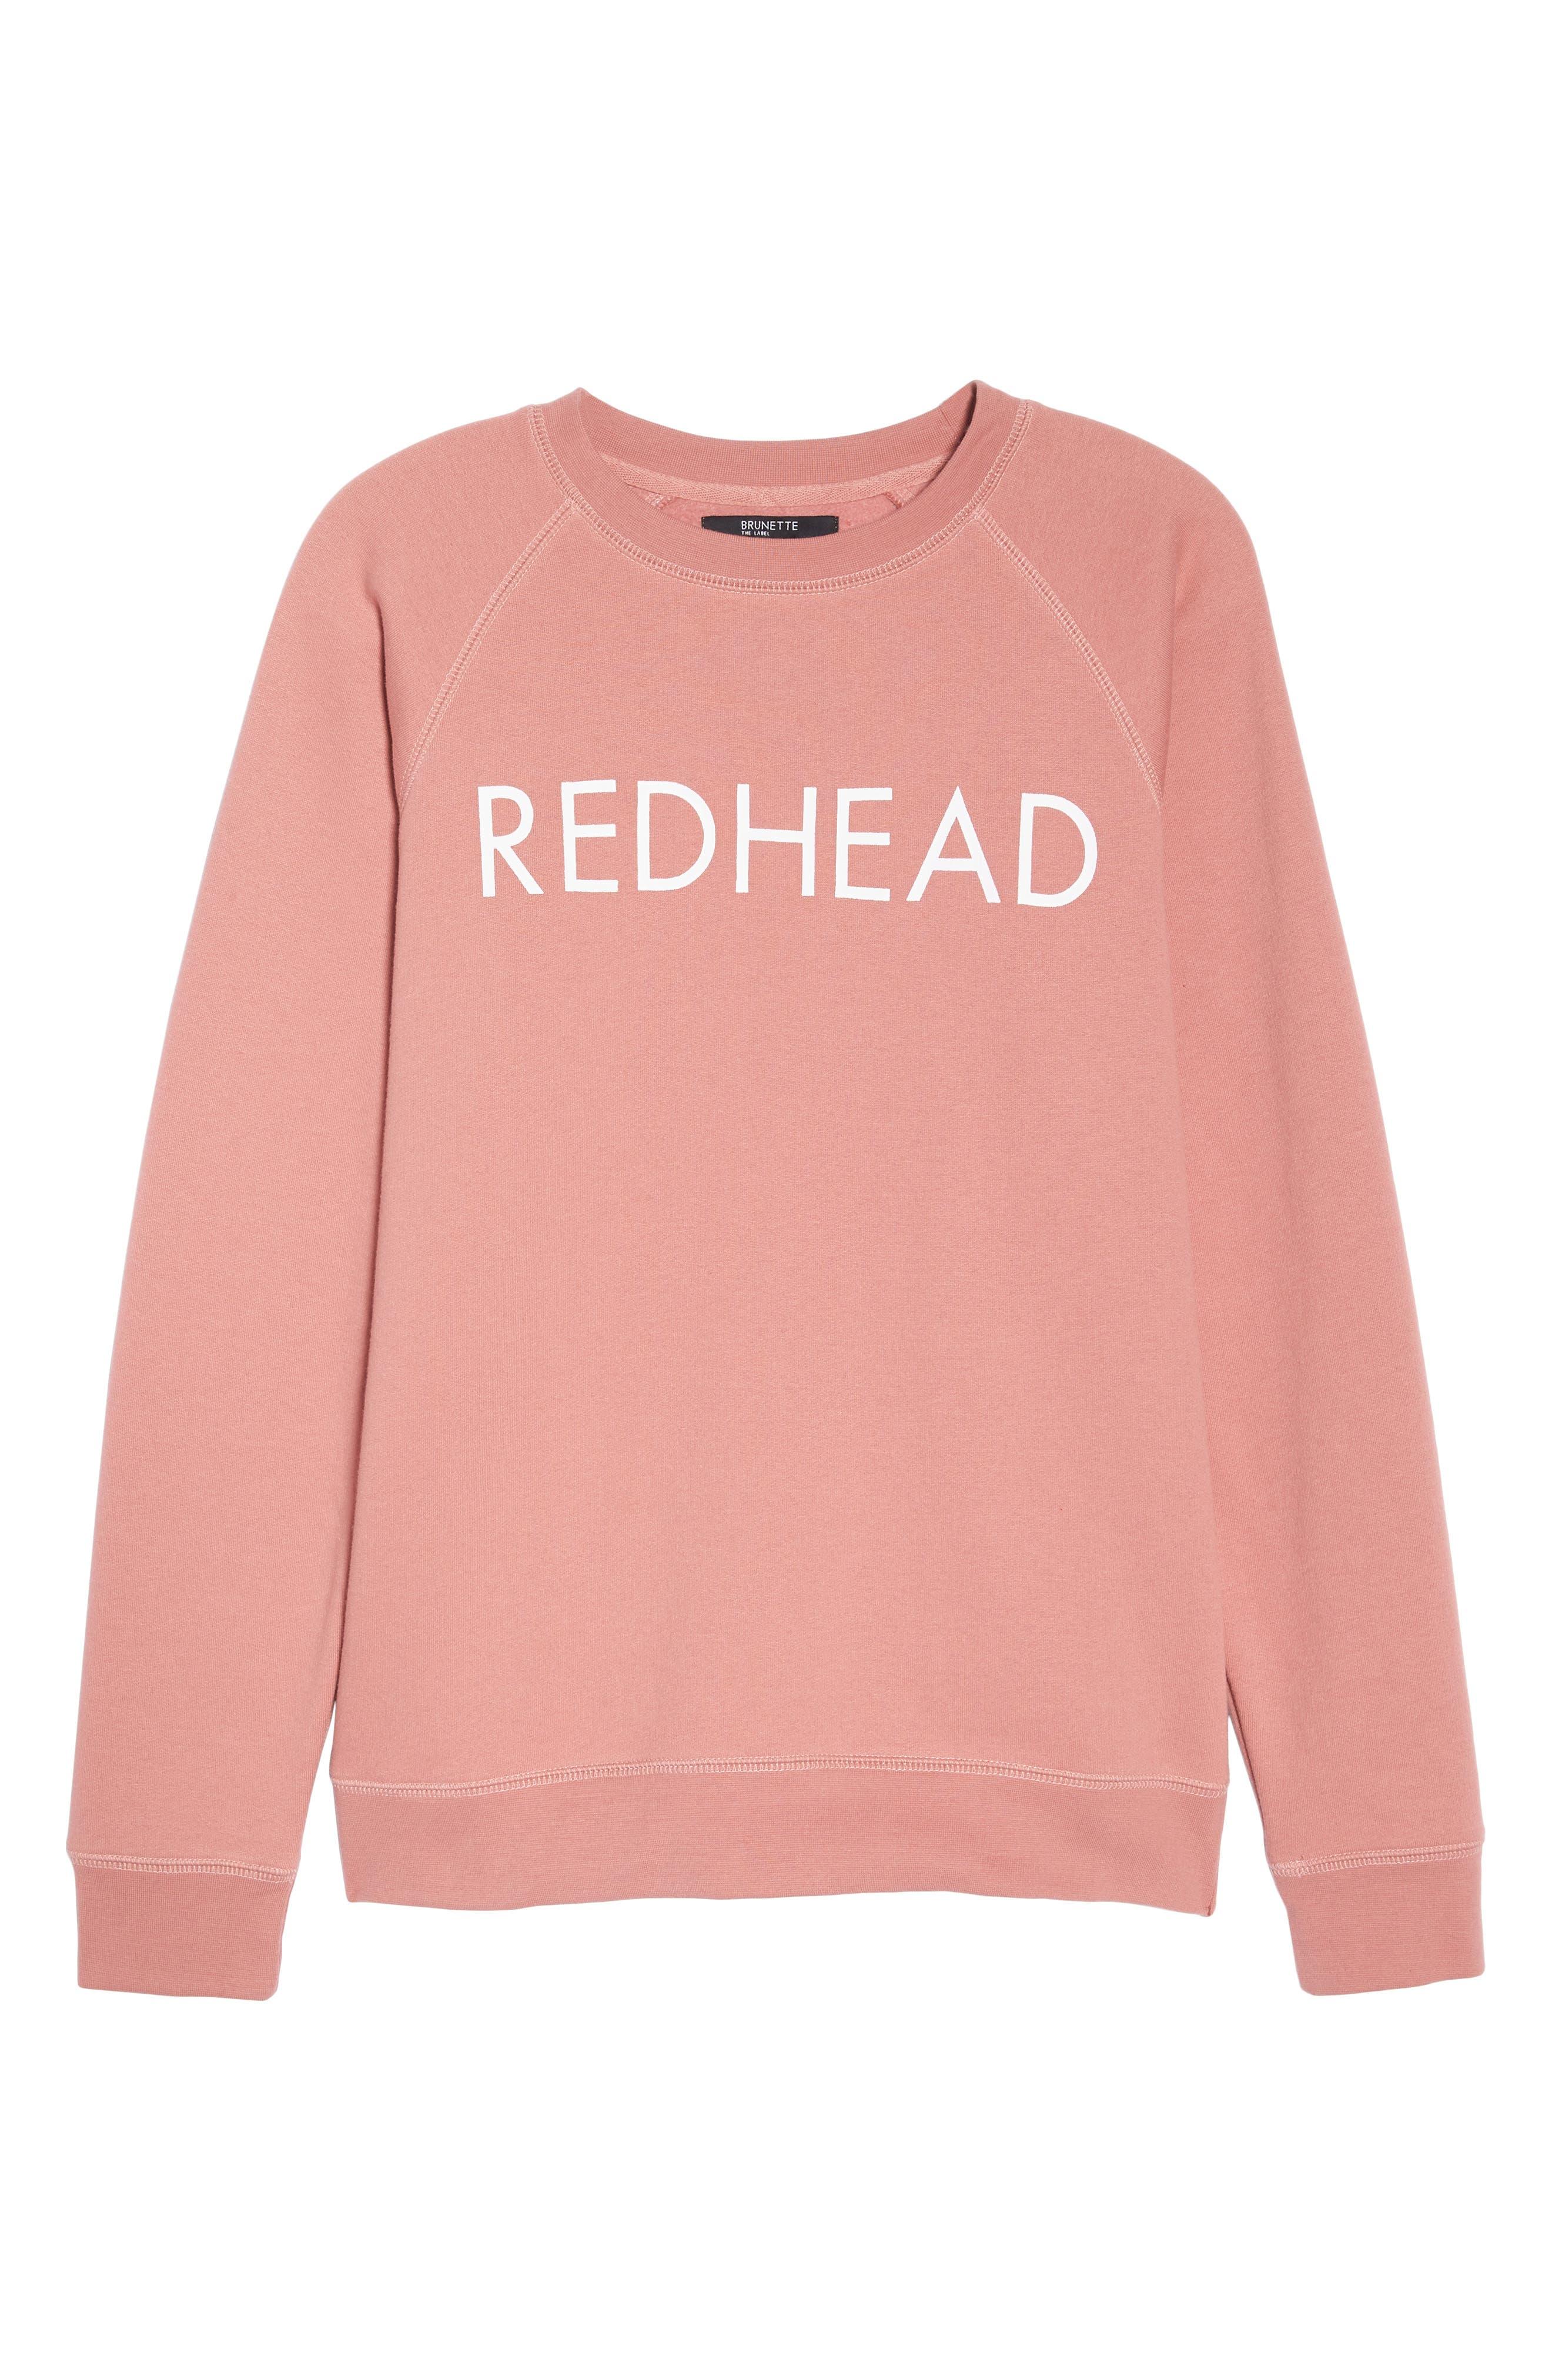 Redhead Crewneck Sweatshirt,                             Alternate thumbnail 4, color,                             Dusty Rose